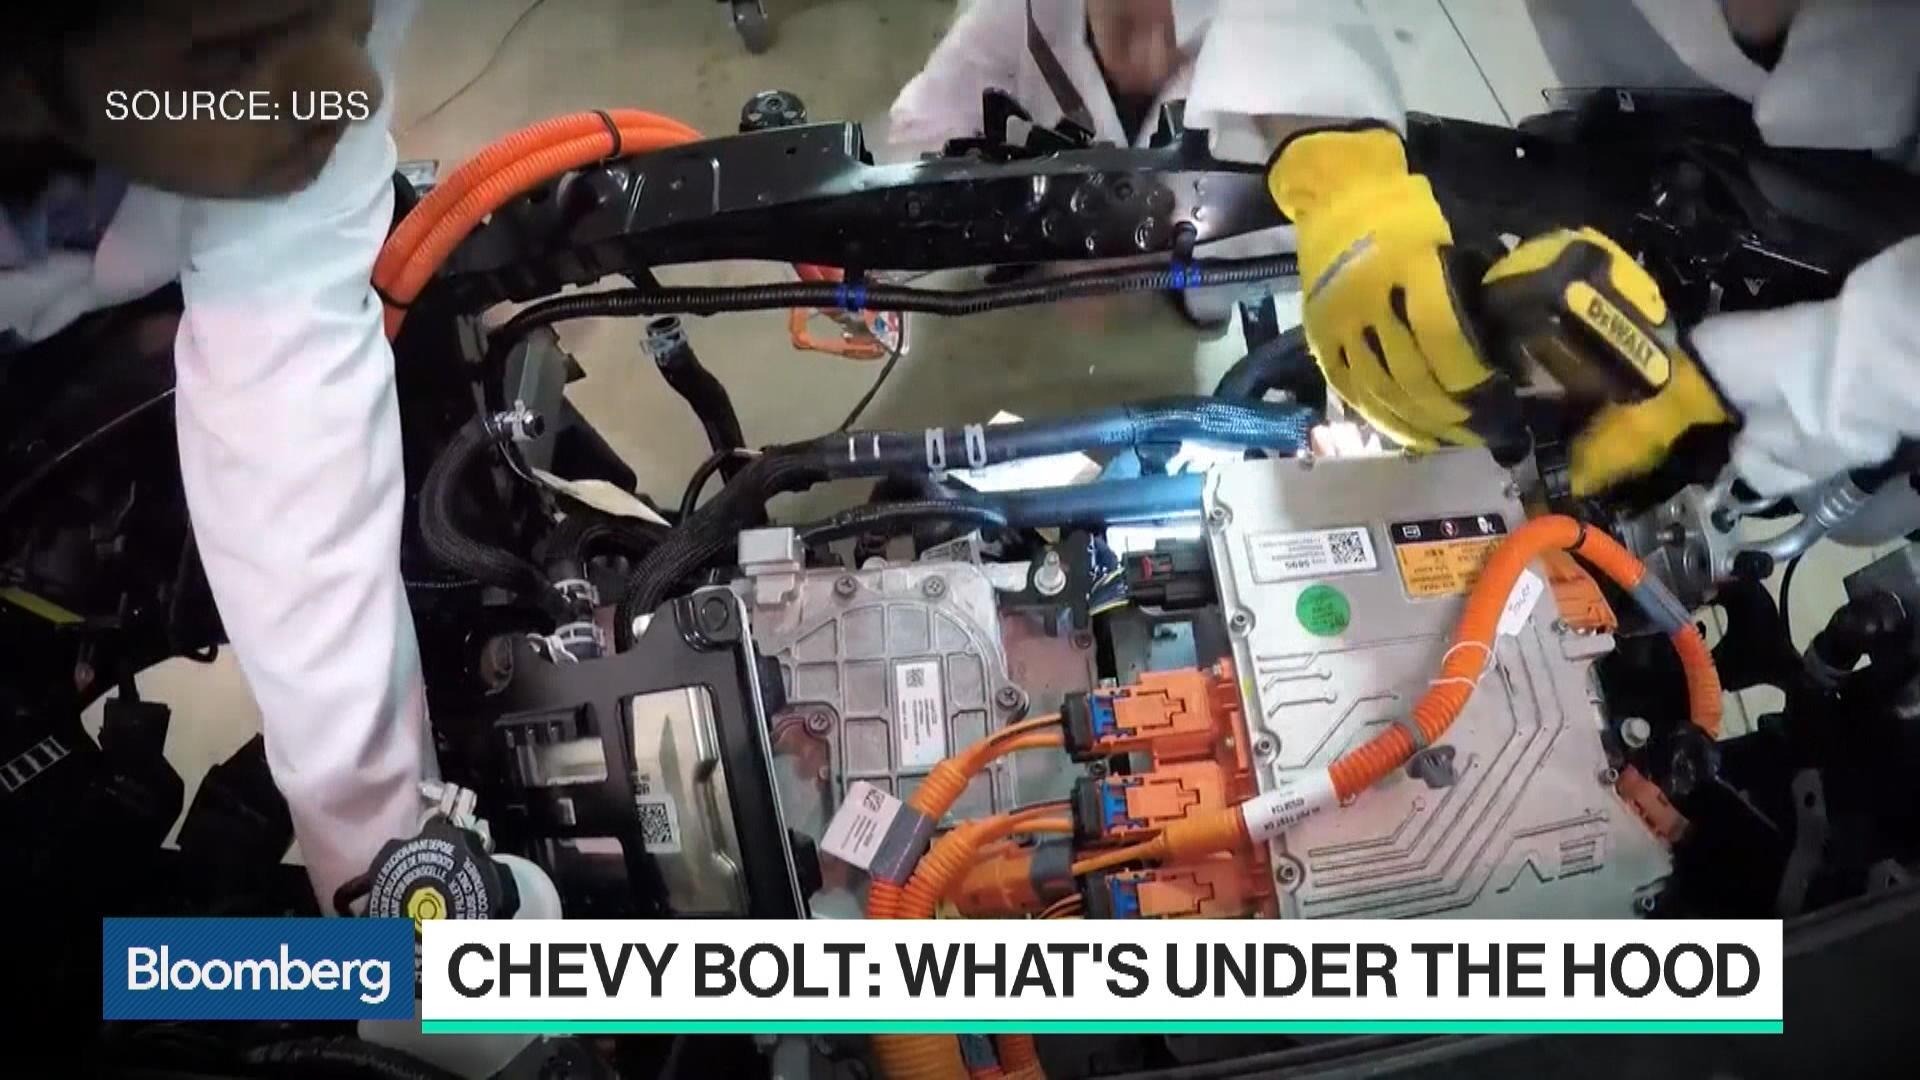 Chevy Bolt Under Hood